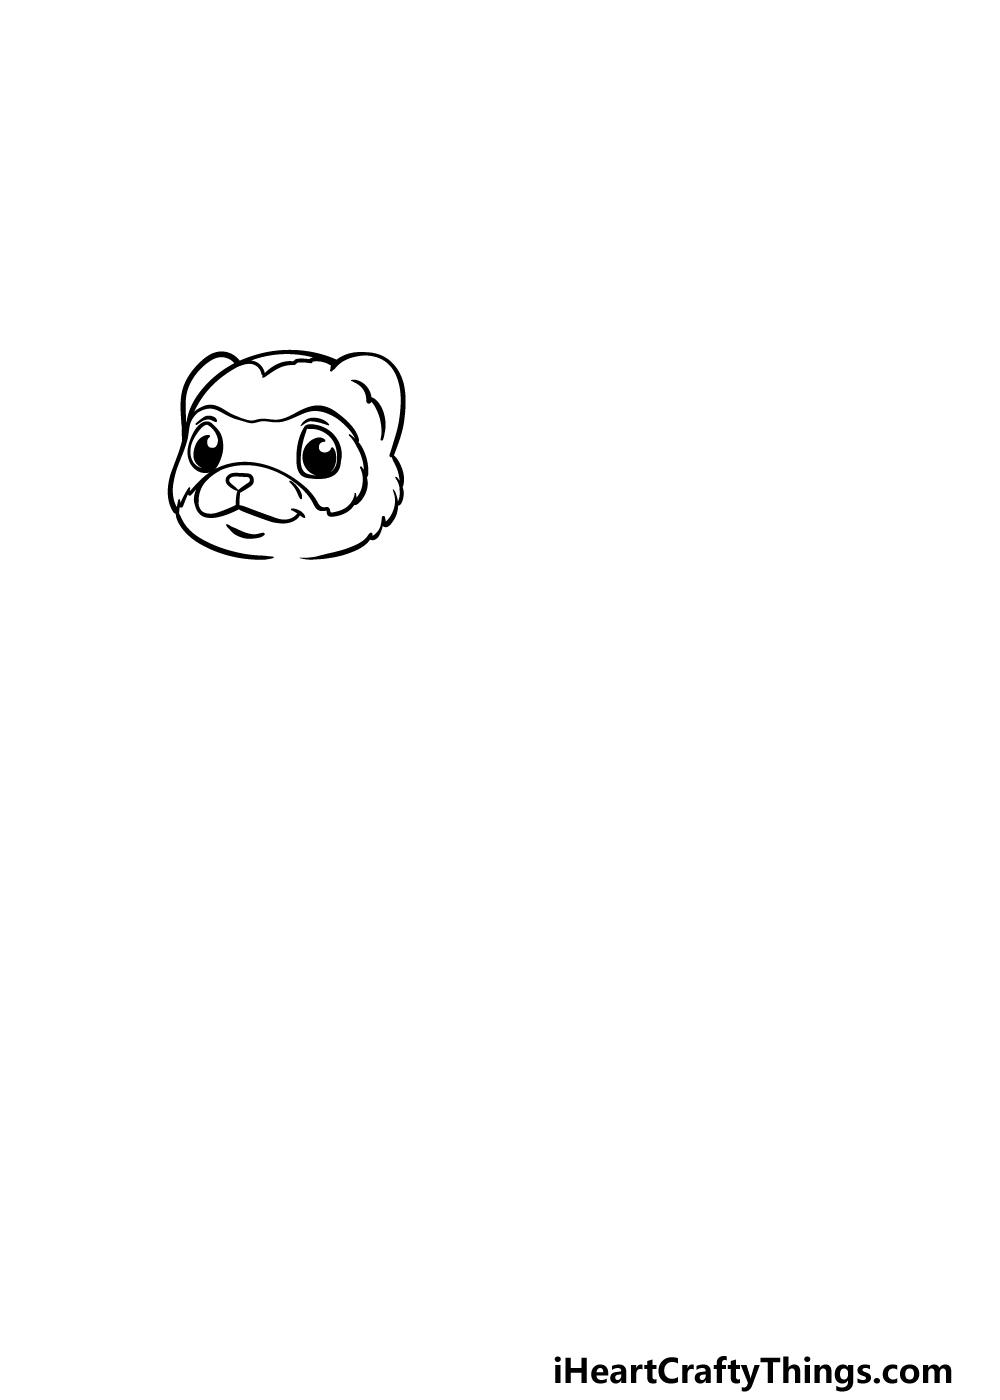 drawing a ferret step 1